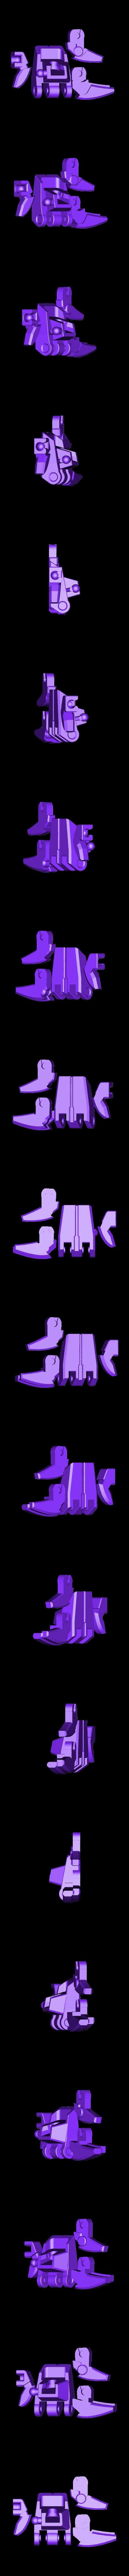 48_Drag_Hand11_FistRight_GREY.stl Download STL file ARTICULATED DRAGONLORD (not Dragonzord) - NO SUPPORT • 3D printer model, Toymakr3D